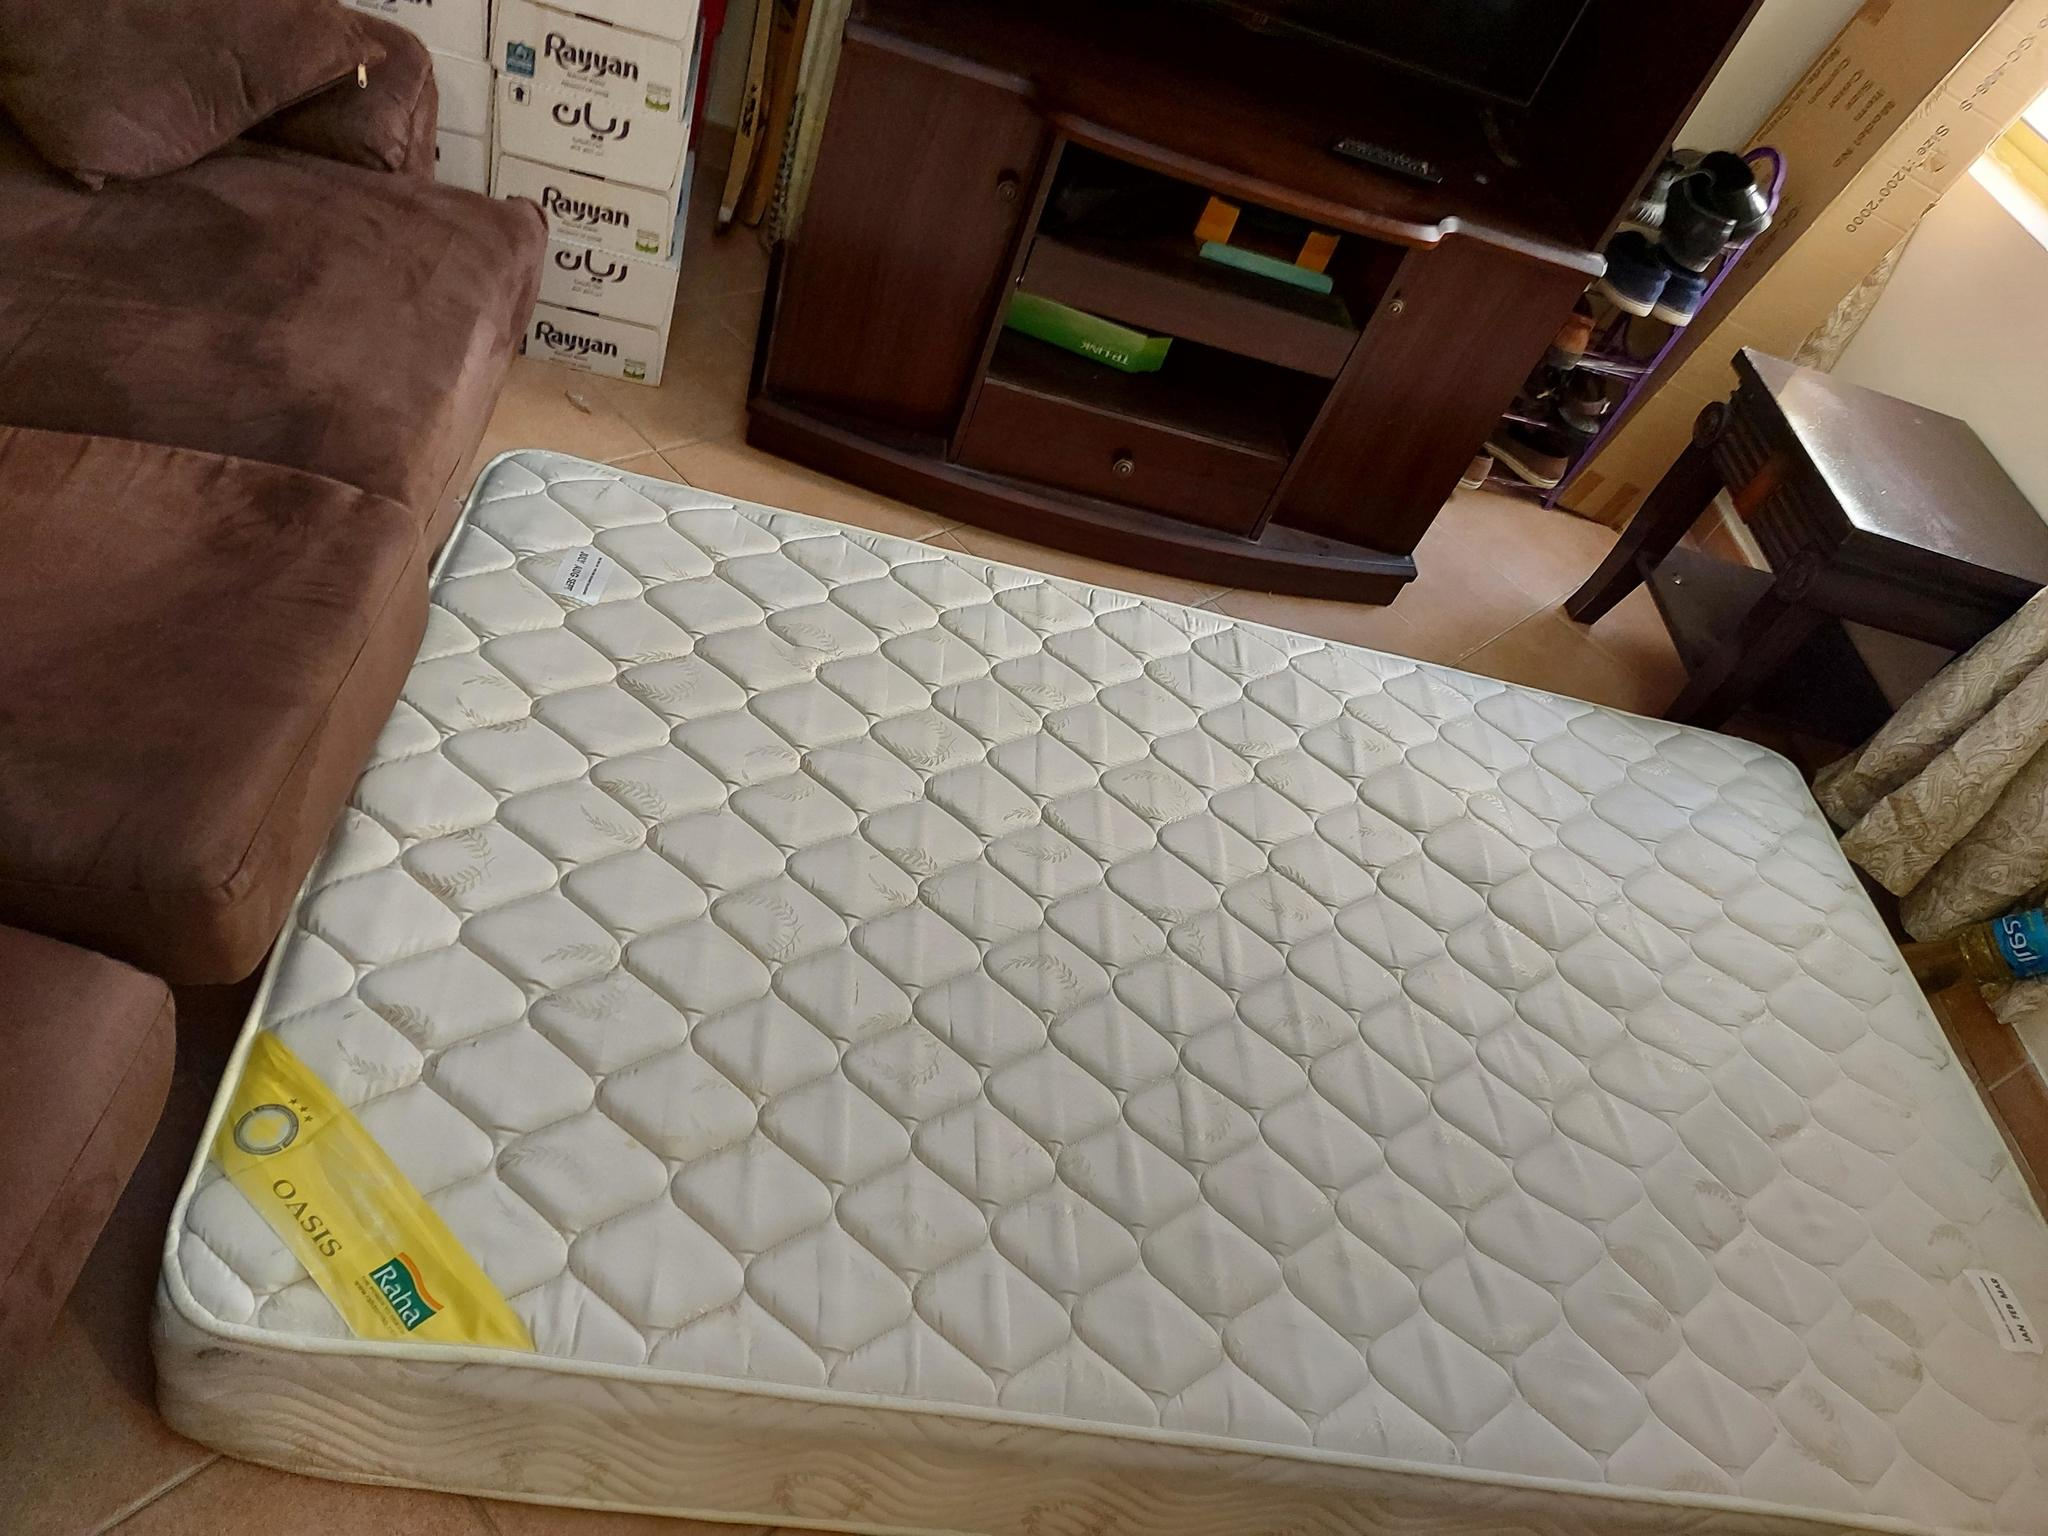 Medium King size mattres 120*200×30 Cm Orthopaedic